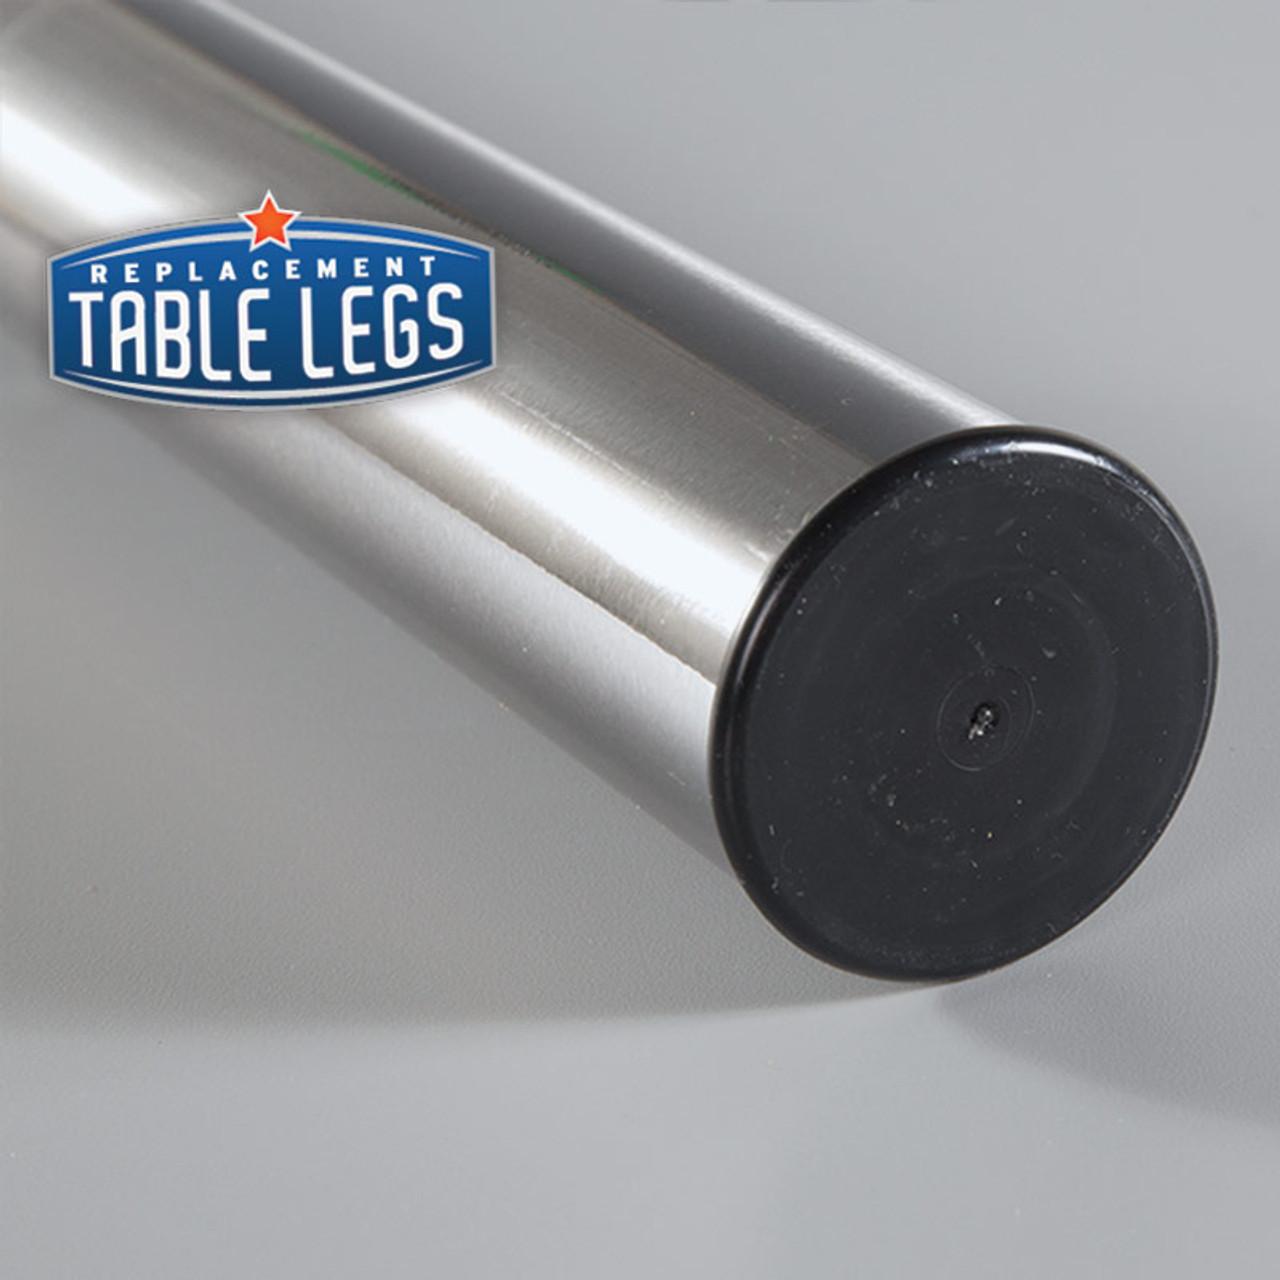 Brushed Steel Studio Telescoping Table Leg foot detail  - replacementtablelegs.com